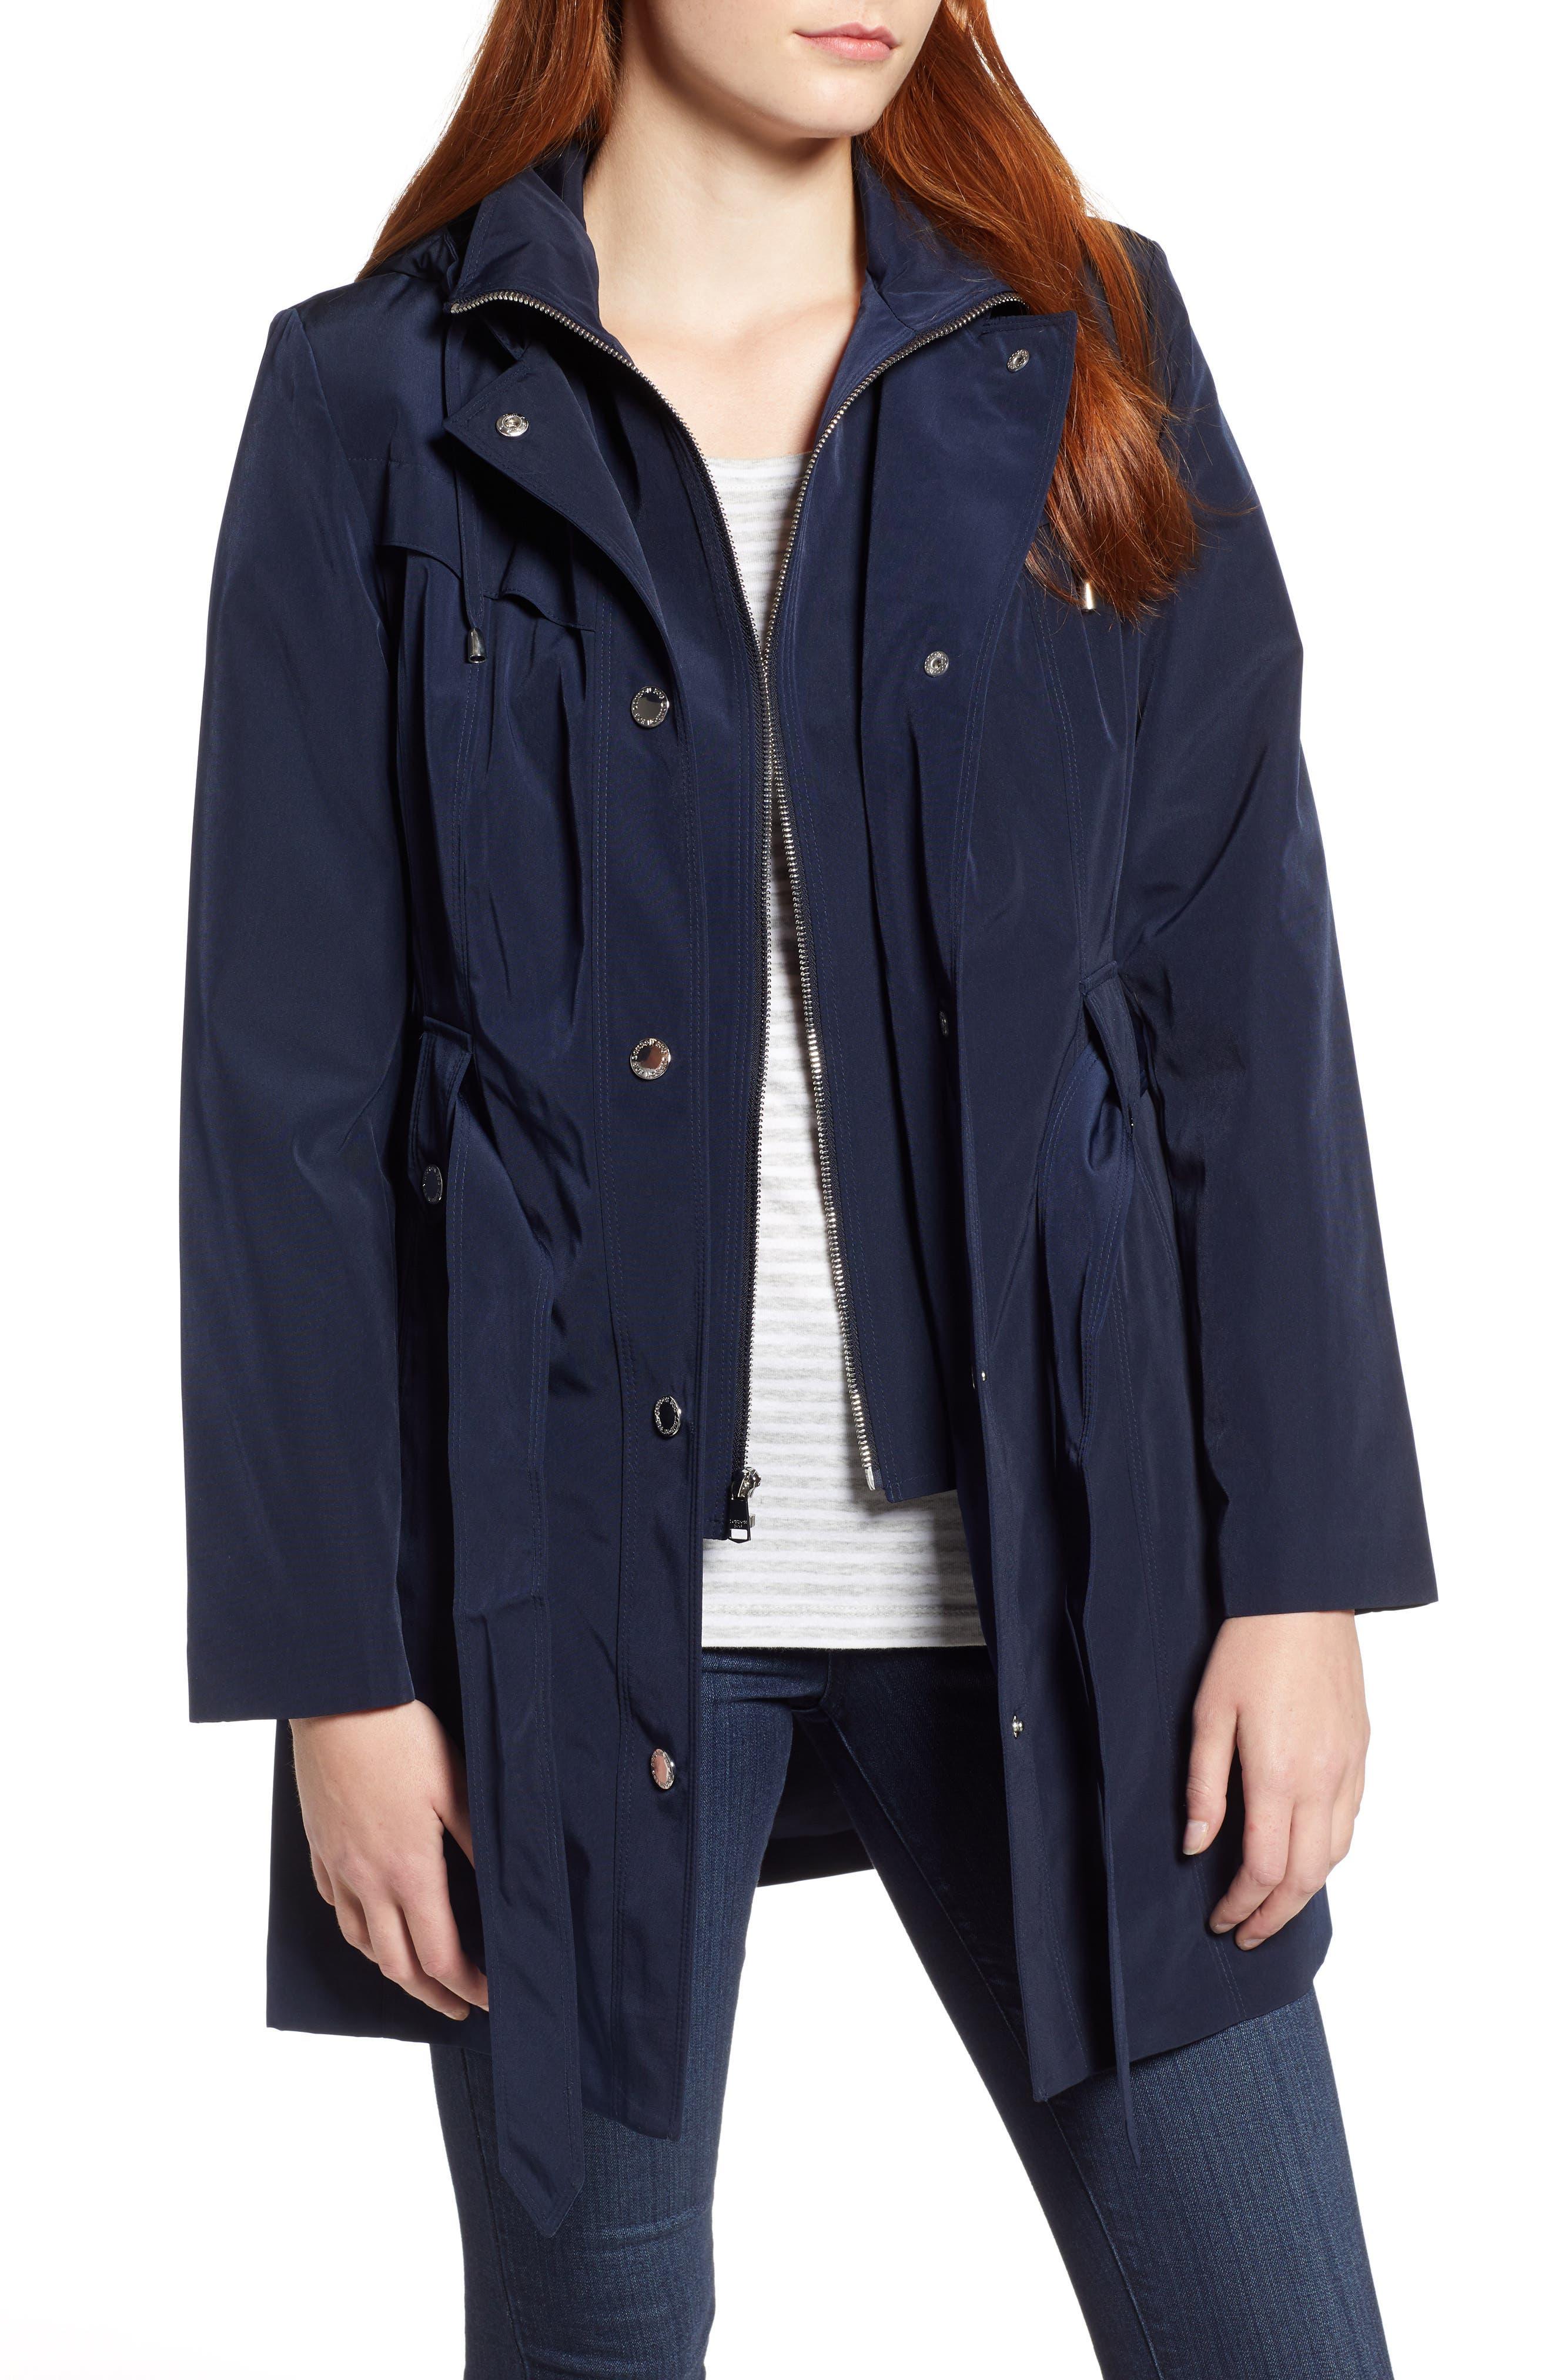 LONDON FOG, Hooded Trench Coat, Main thumbnail 1, color, NAVY